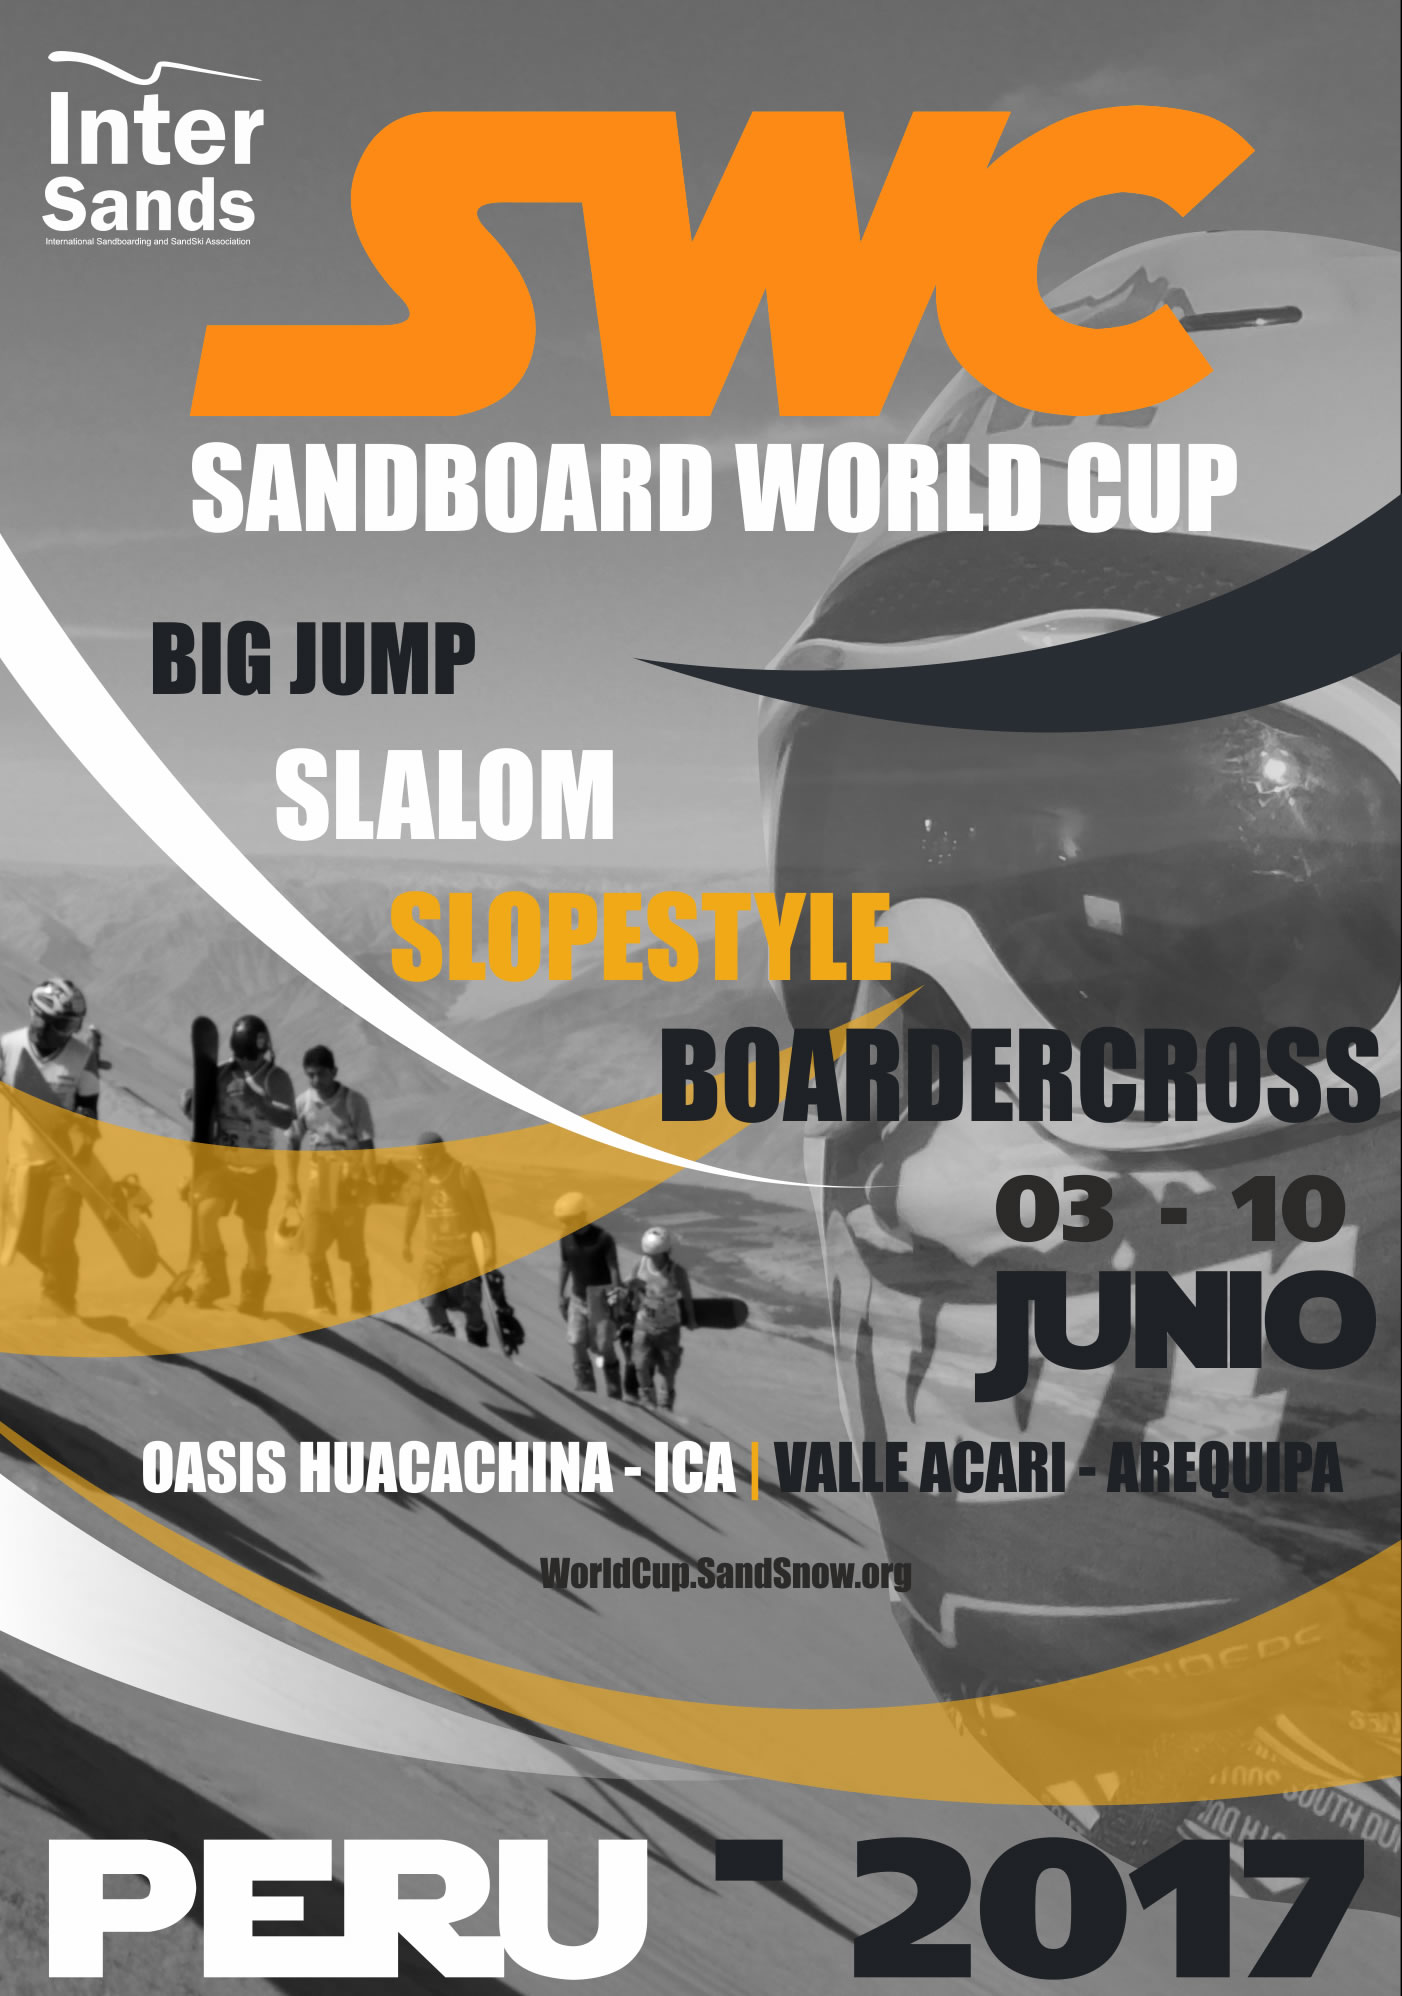 Sandboard World Cup 2017